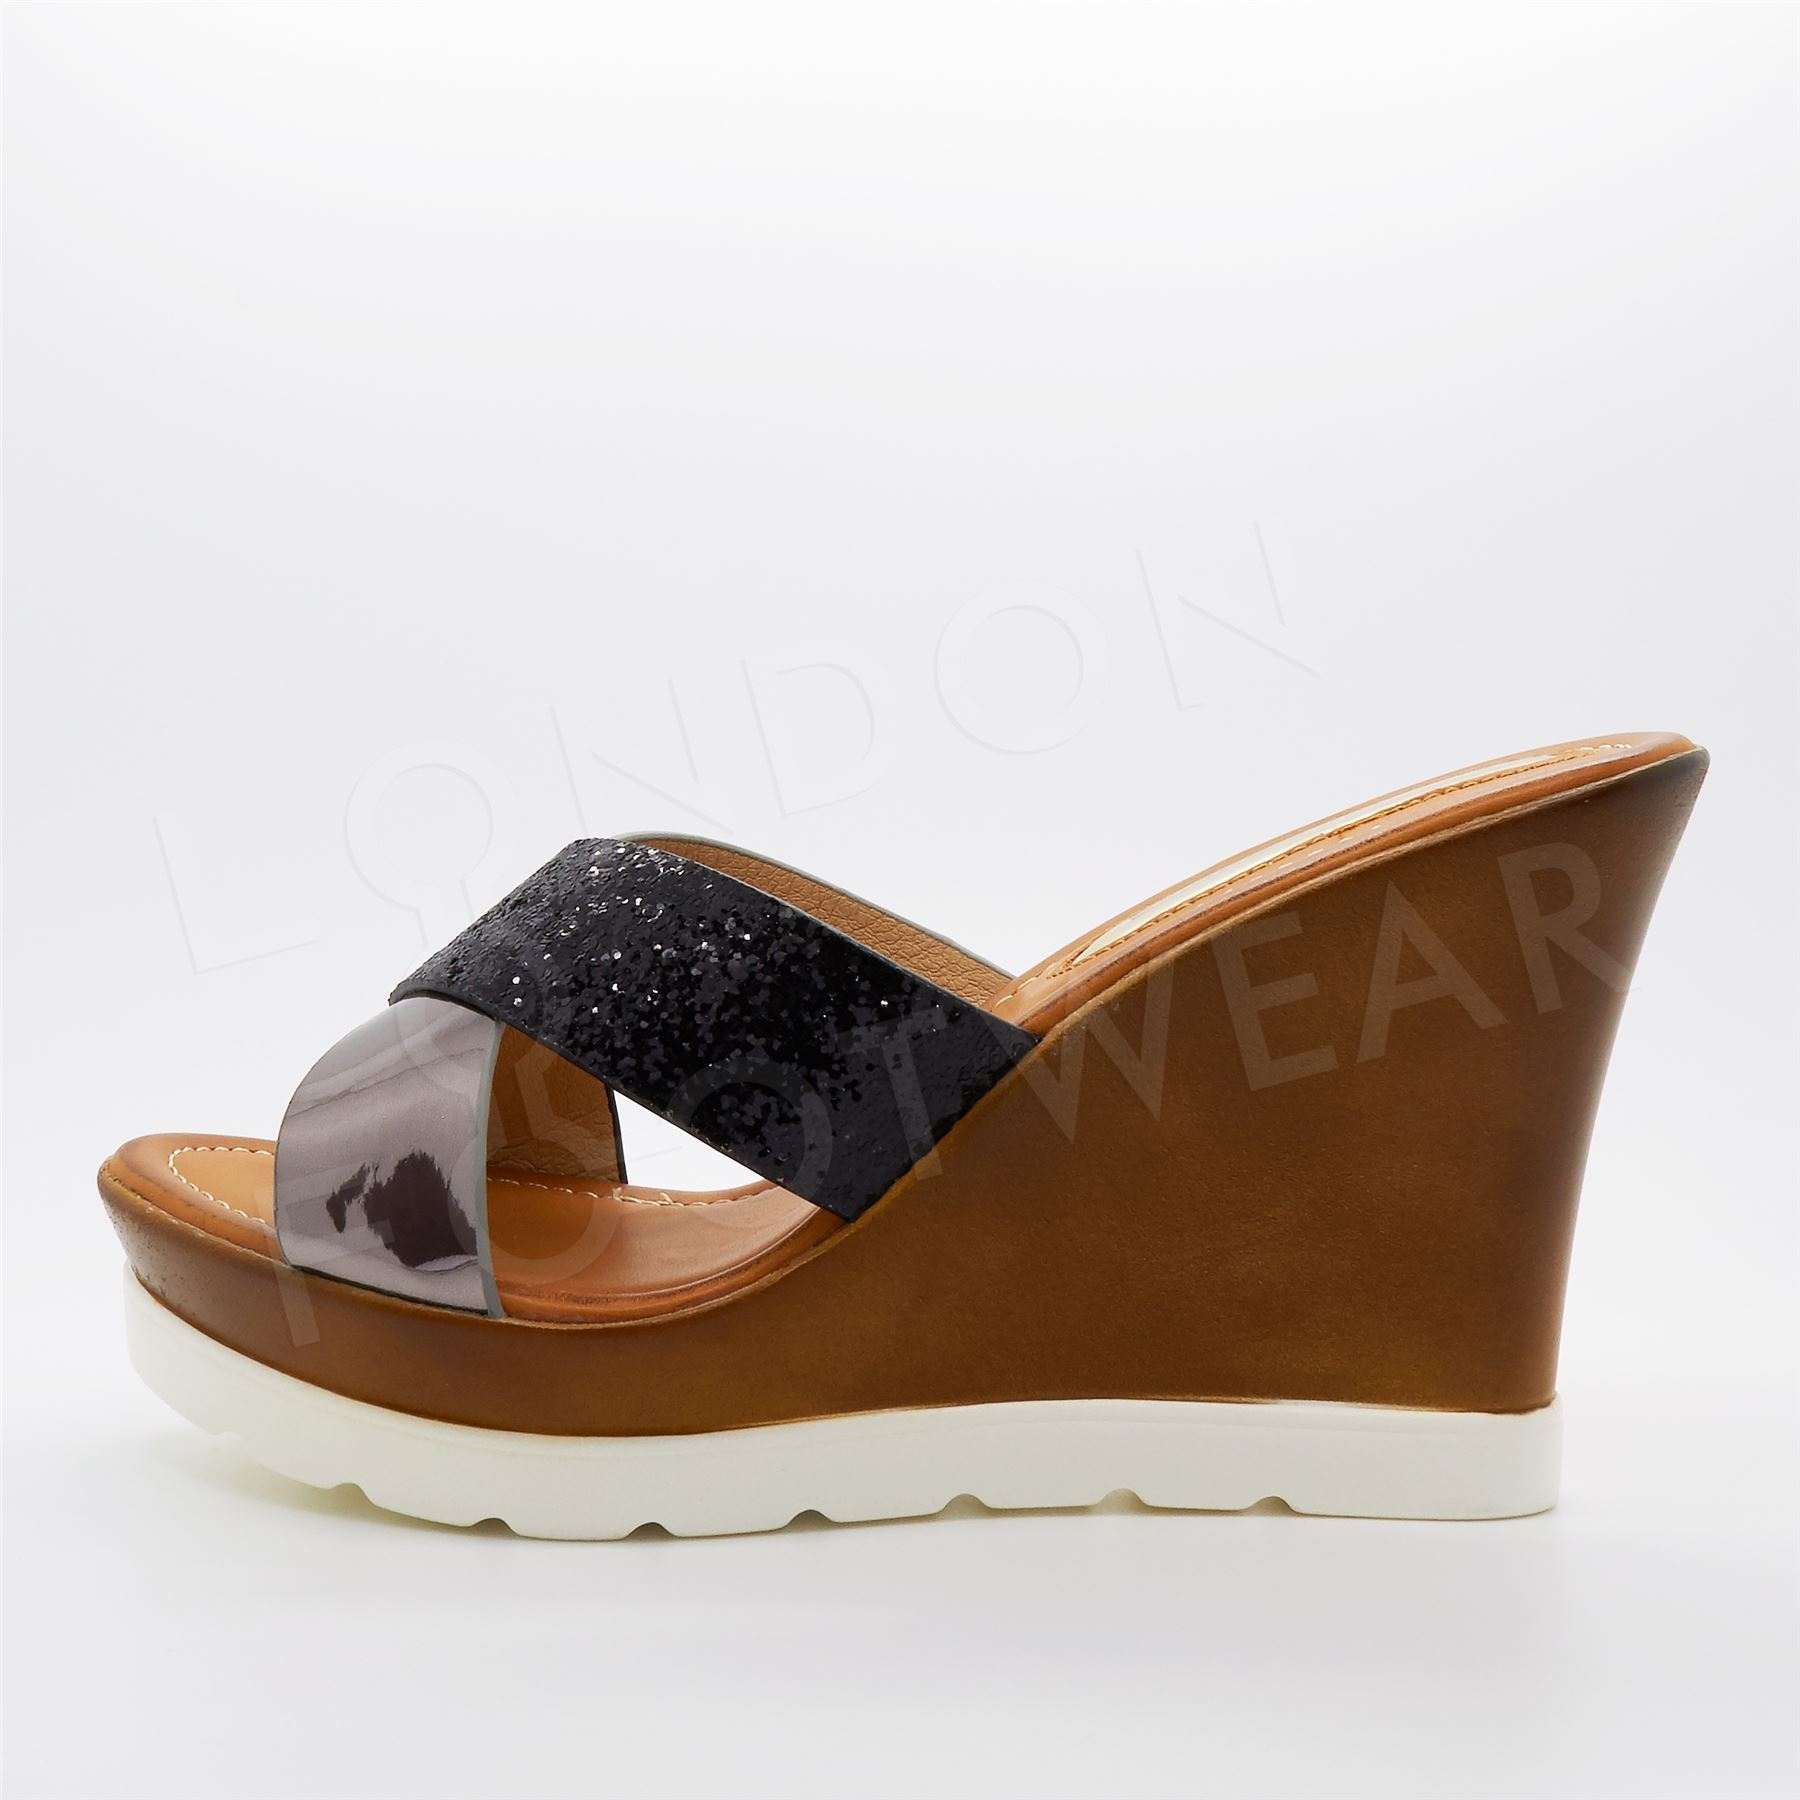 156b94c2f27e Womens Wedge Heel Platform Sandals Ladies Chunky Cleated Sole Slip ...